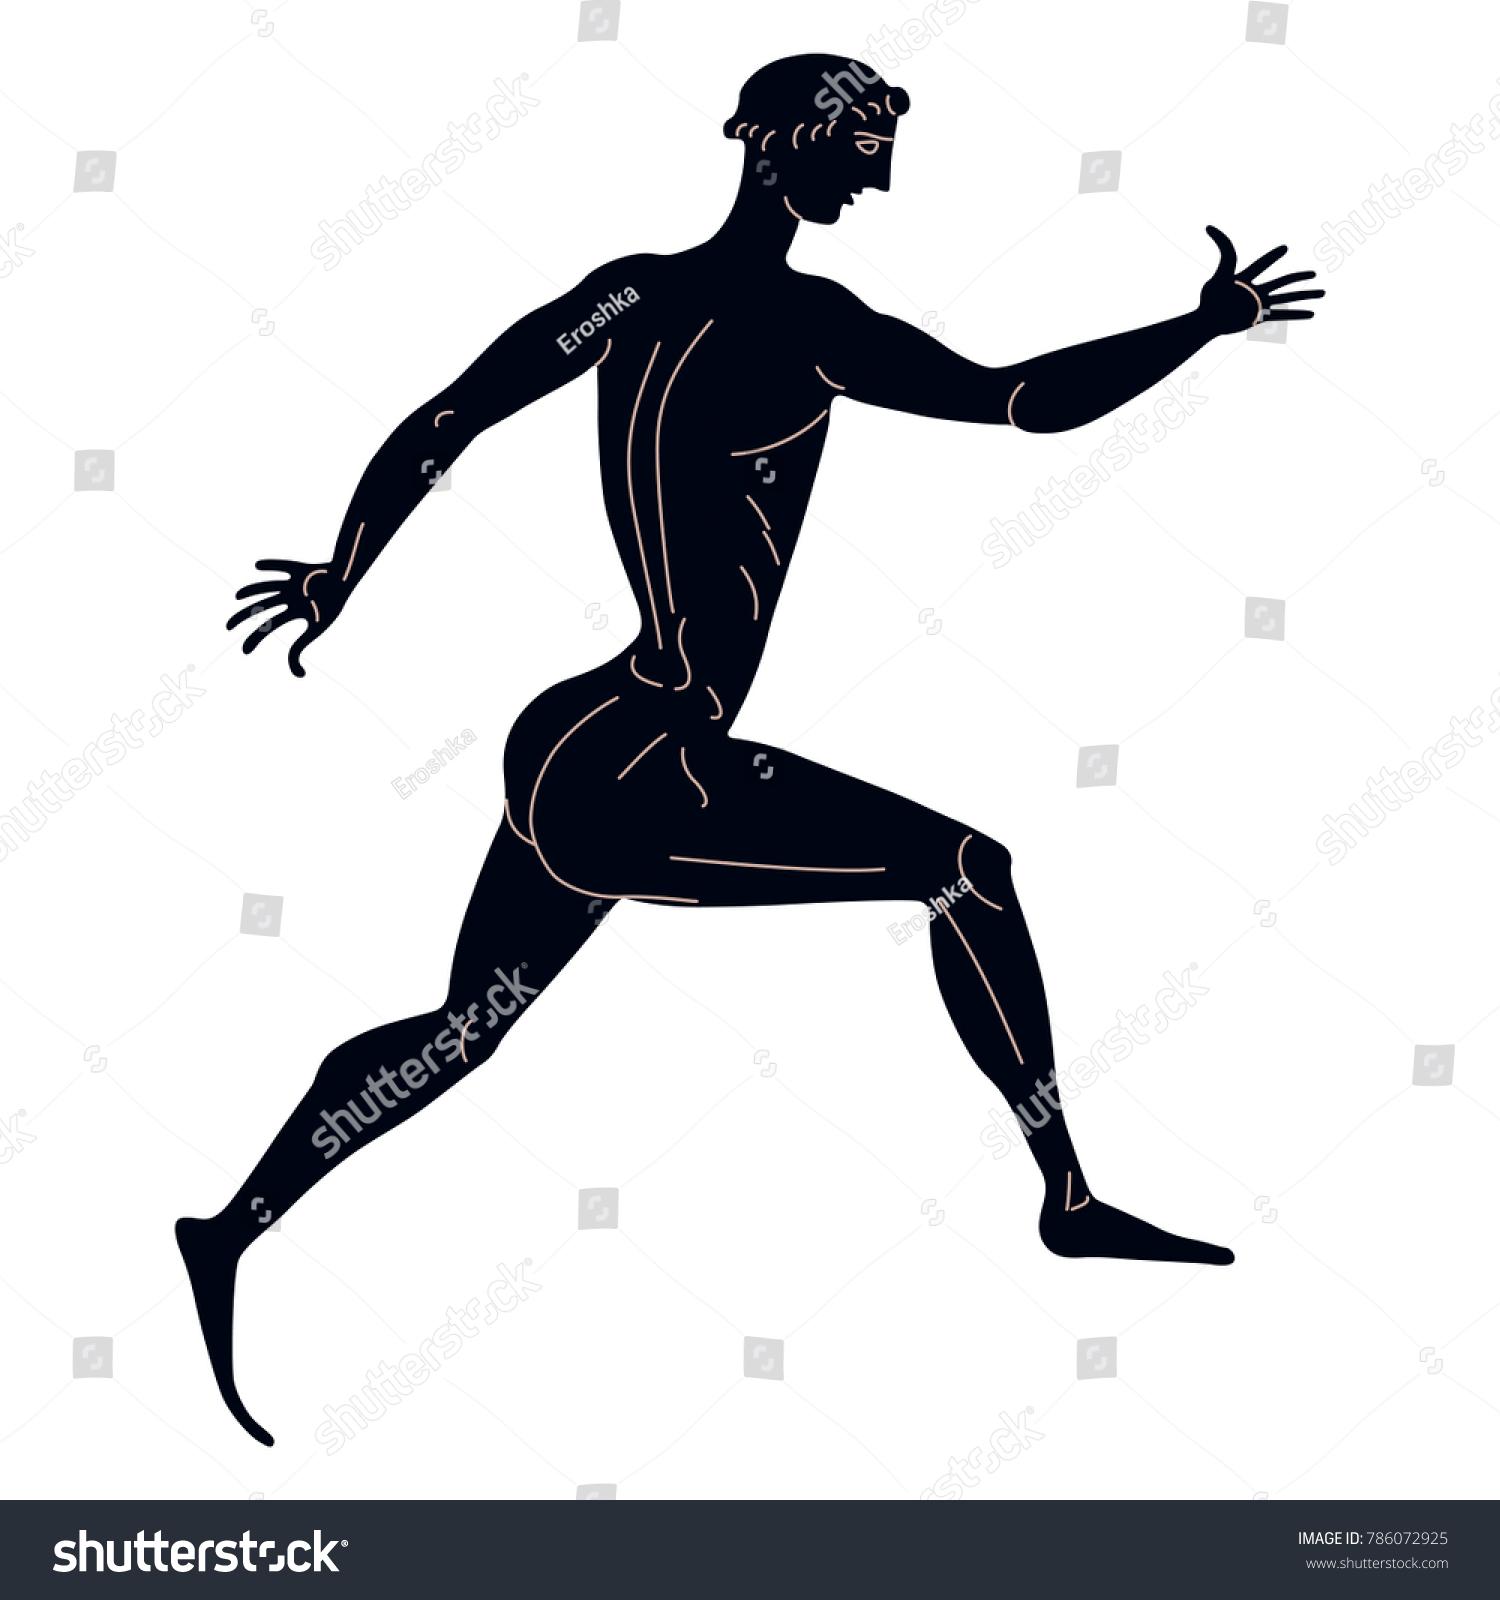 Isolated vector illustration ancient greek runner stock vector isolated vector illustration ancient greek runner based on classical black figure vase painting reviewsmspy